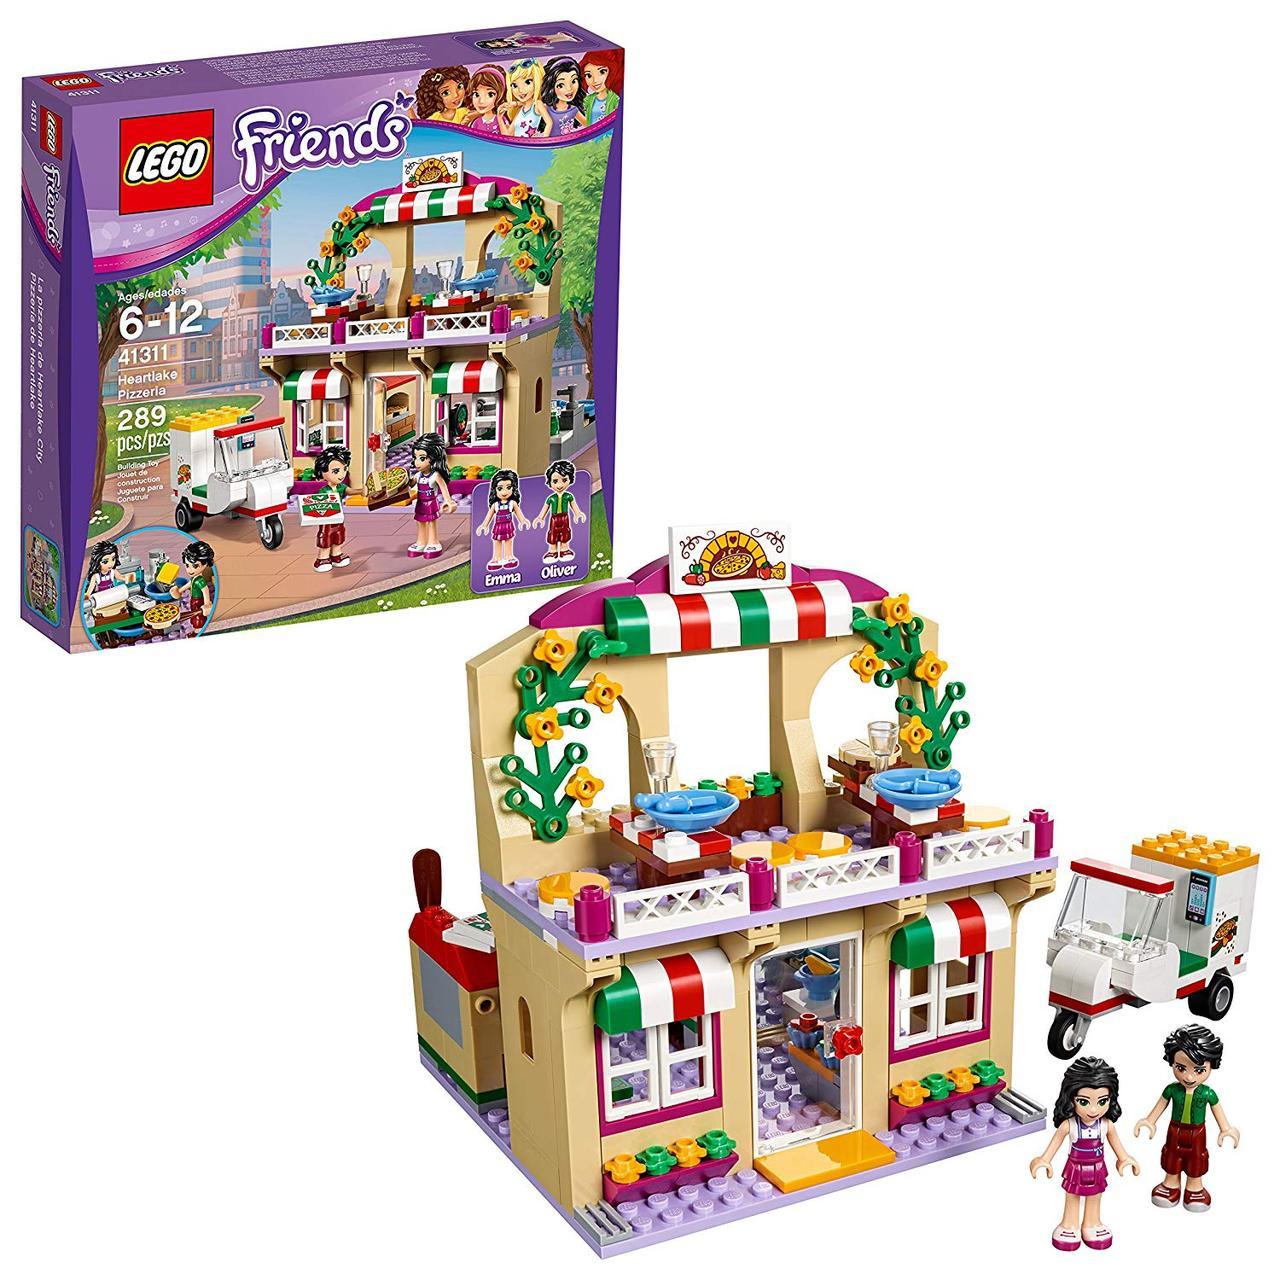 Lego Friends 41311 Heartlake pizzeria. Піцерія Хартлейк Сіті (Конструктор Лего Френдс Пиццерия в Хартлейке)